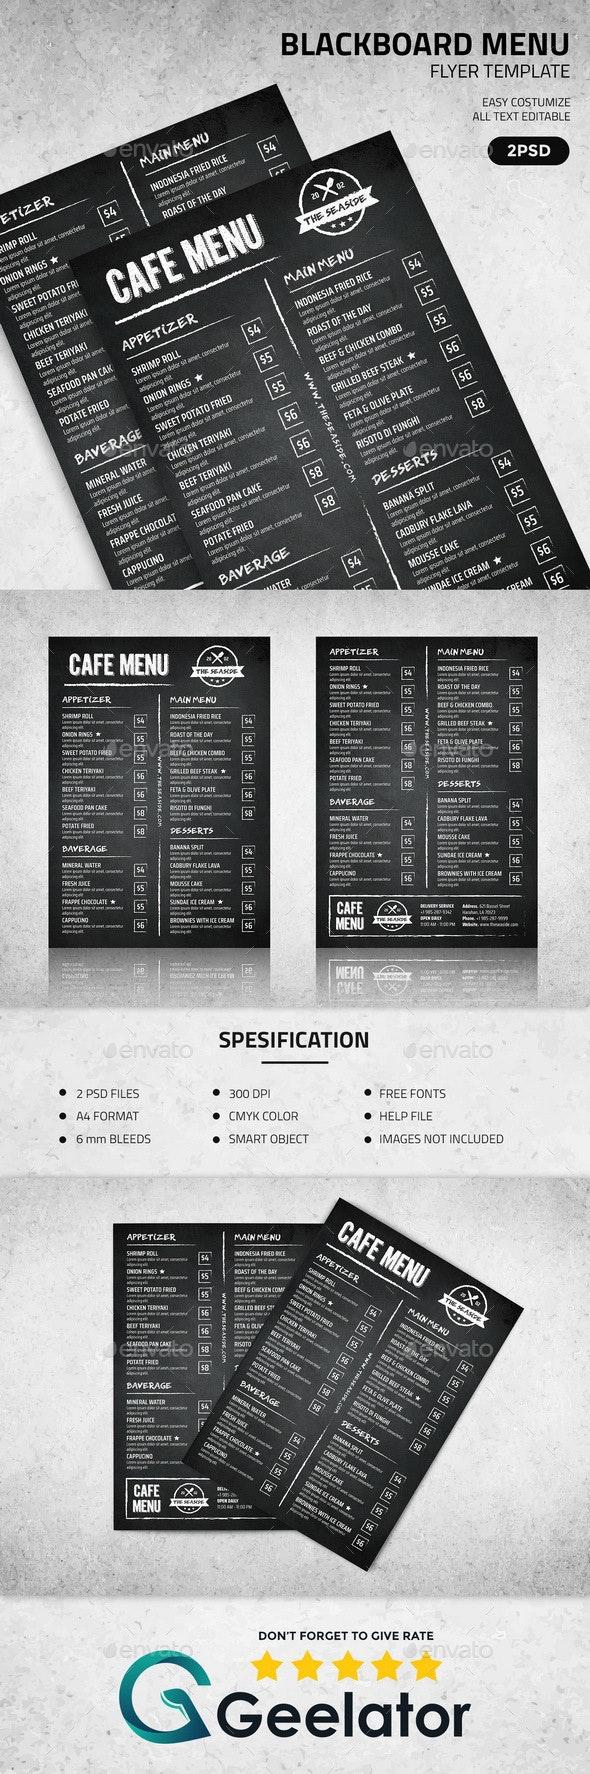 Blackboard Menu Flyer Template - Food Menus Print Templates